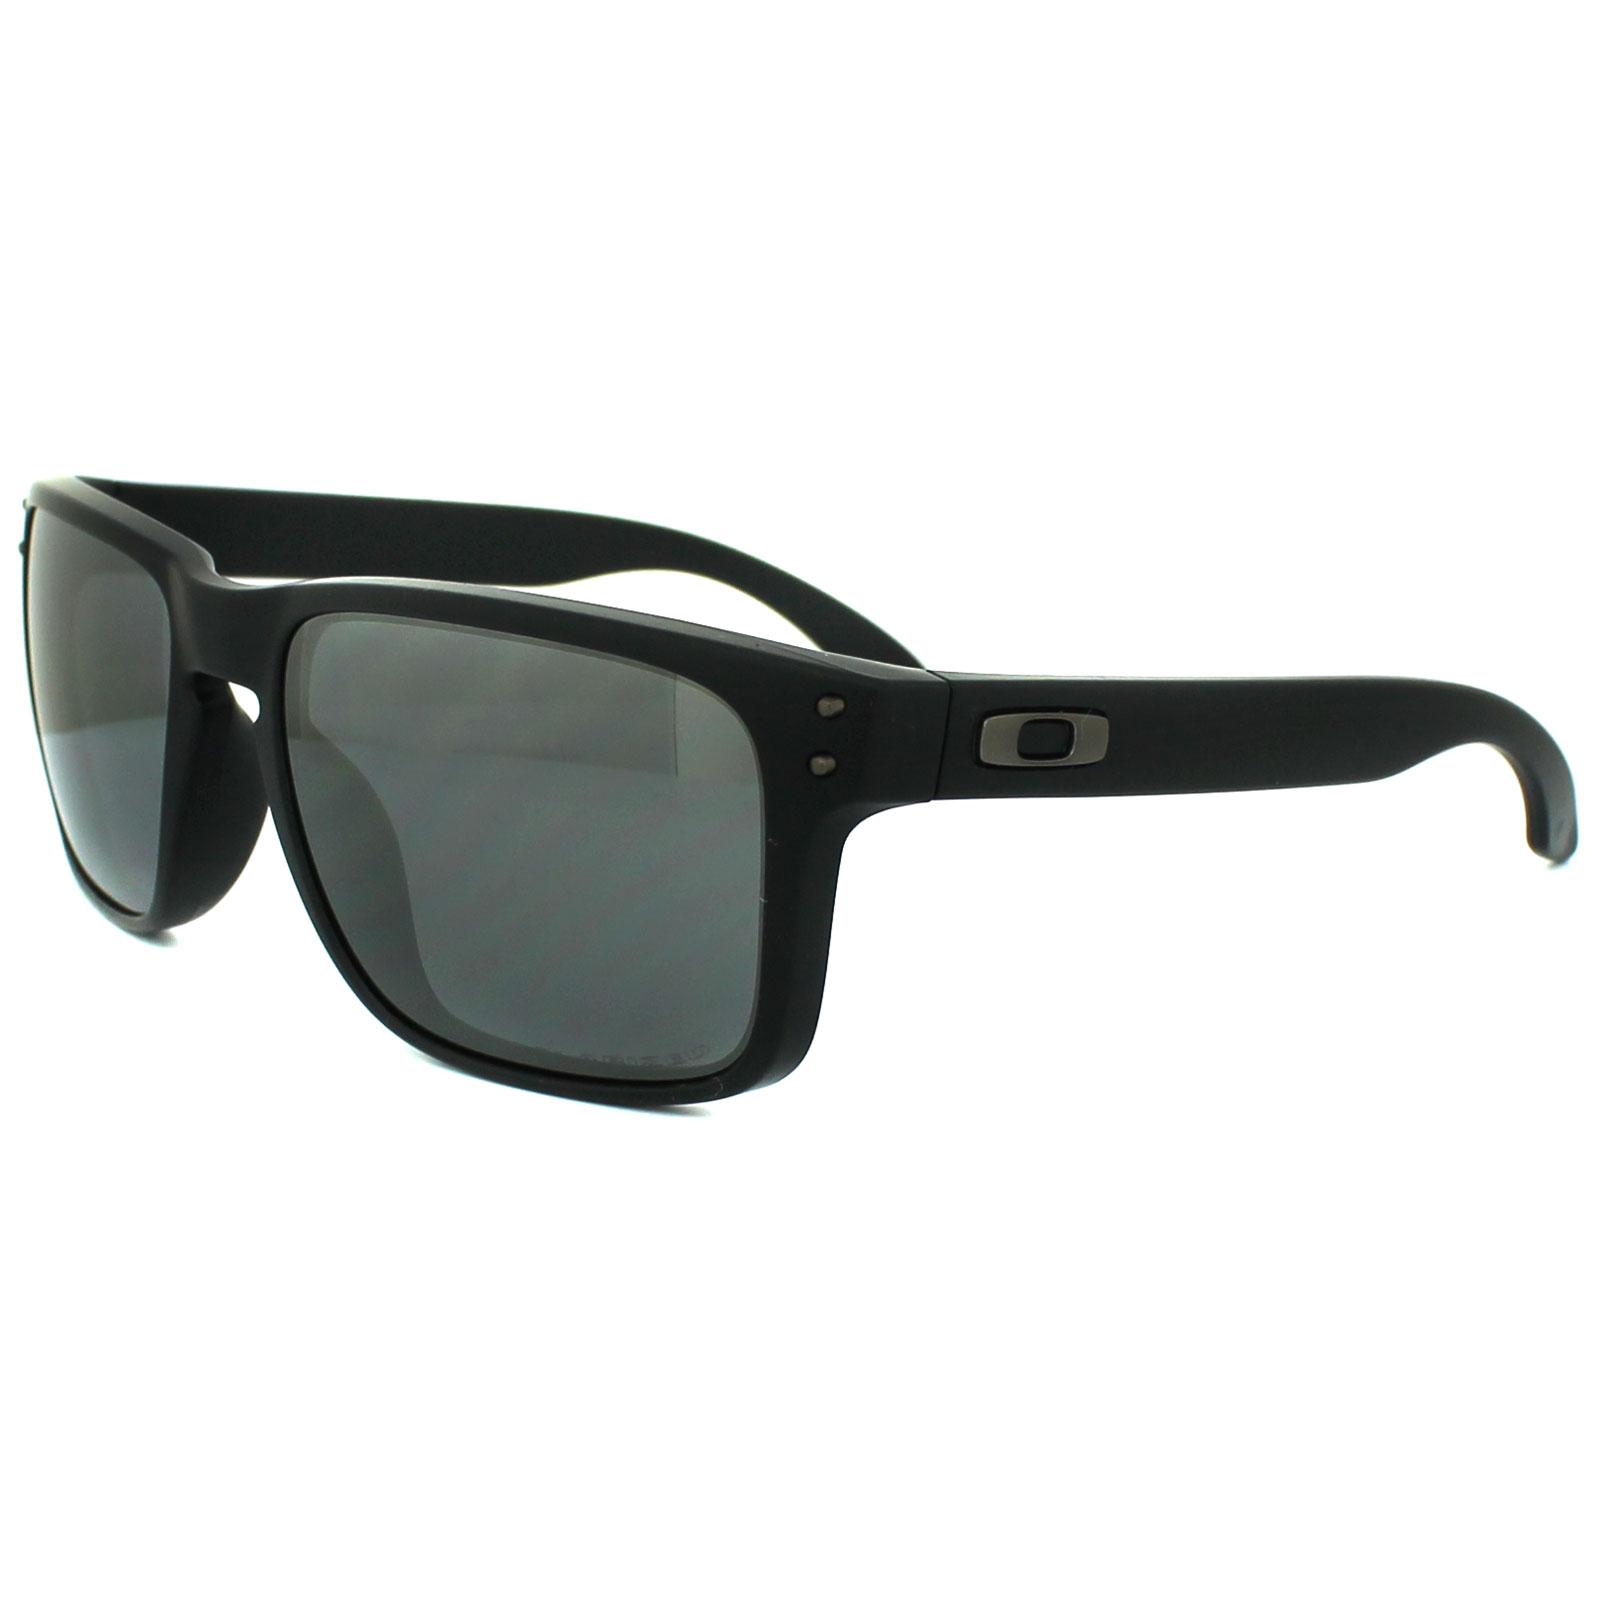 57e3b0b4f5 Sentinel Oakley Sunglasses Holbrook OO9102-62 Matt Black Black Iridium  Polarized